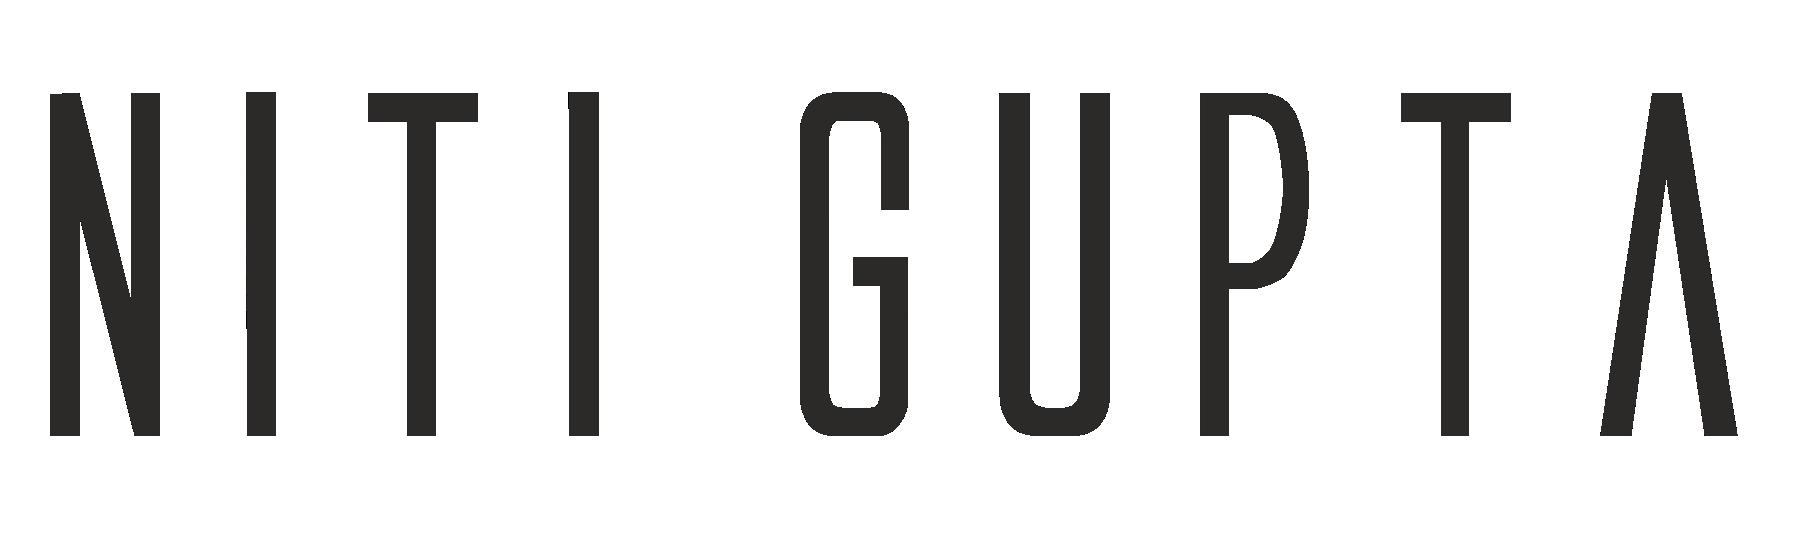 Niti Gupta | DESIGN EVANGELIST & CURATOR